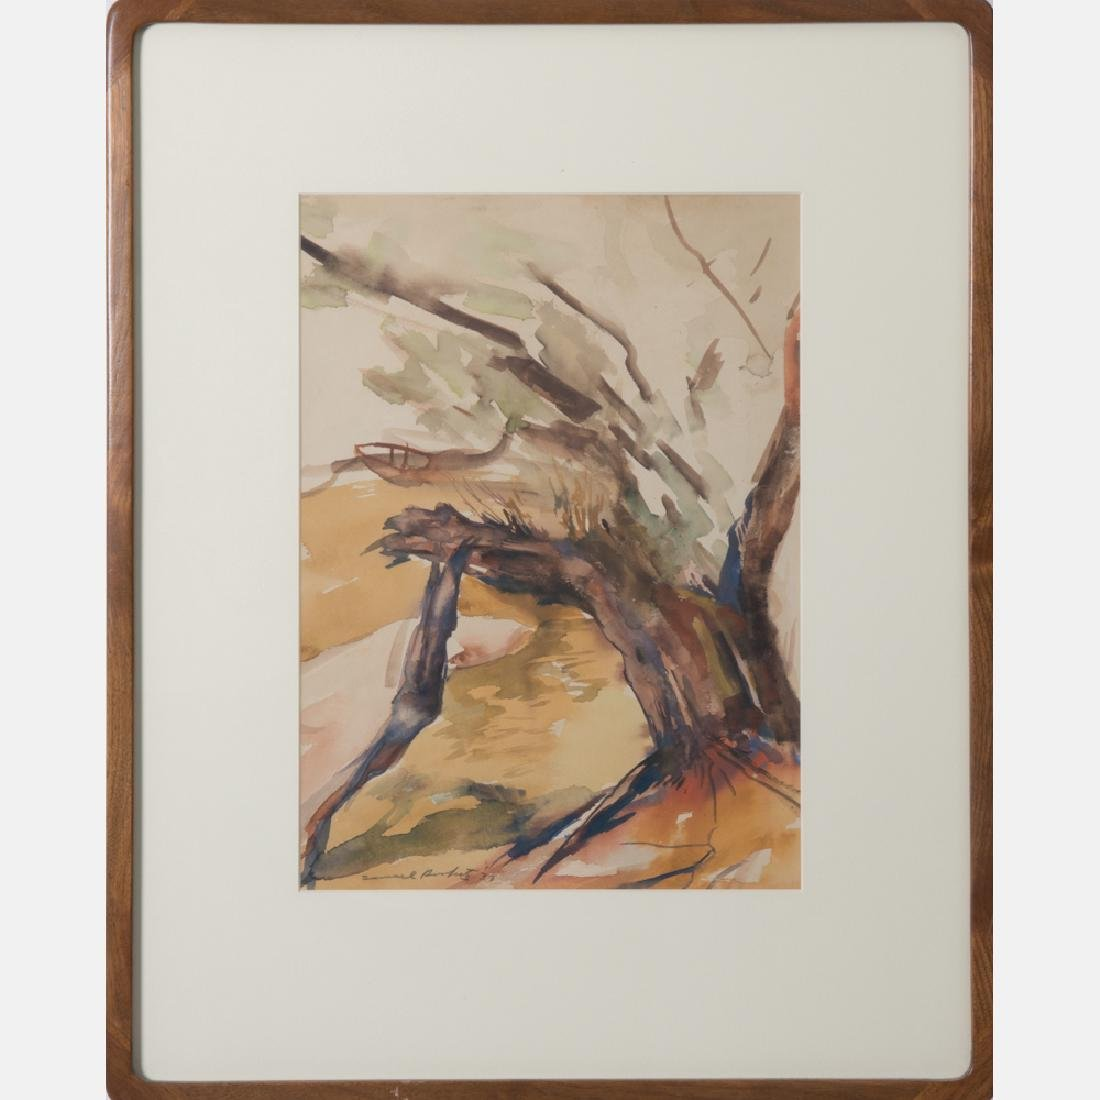 Samuel Bookatz (1910-2009) Untitled, Watercolor,